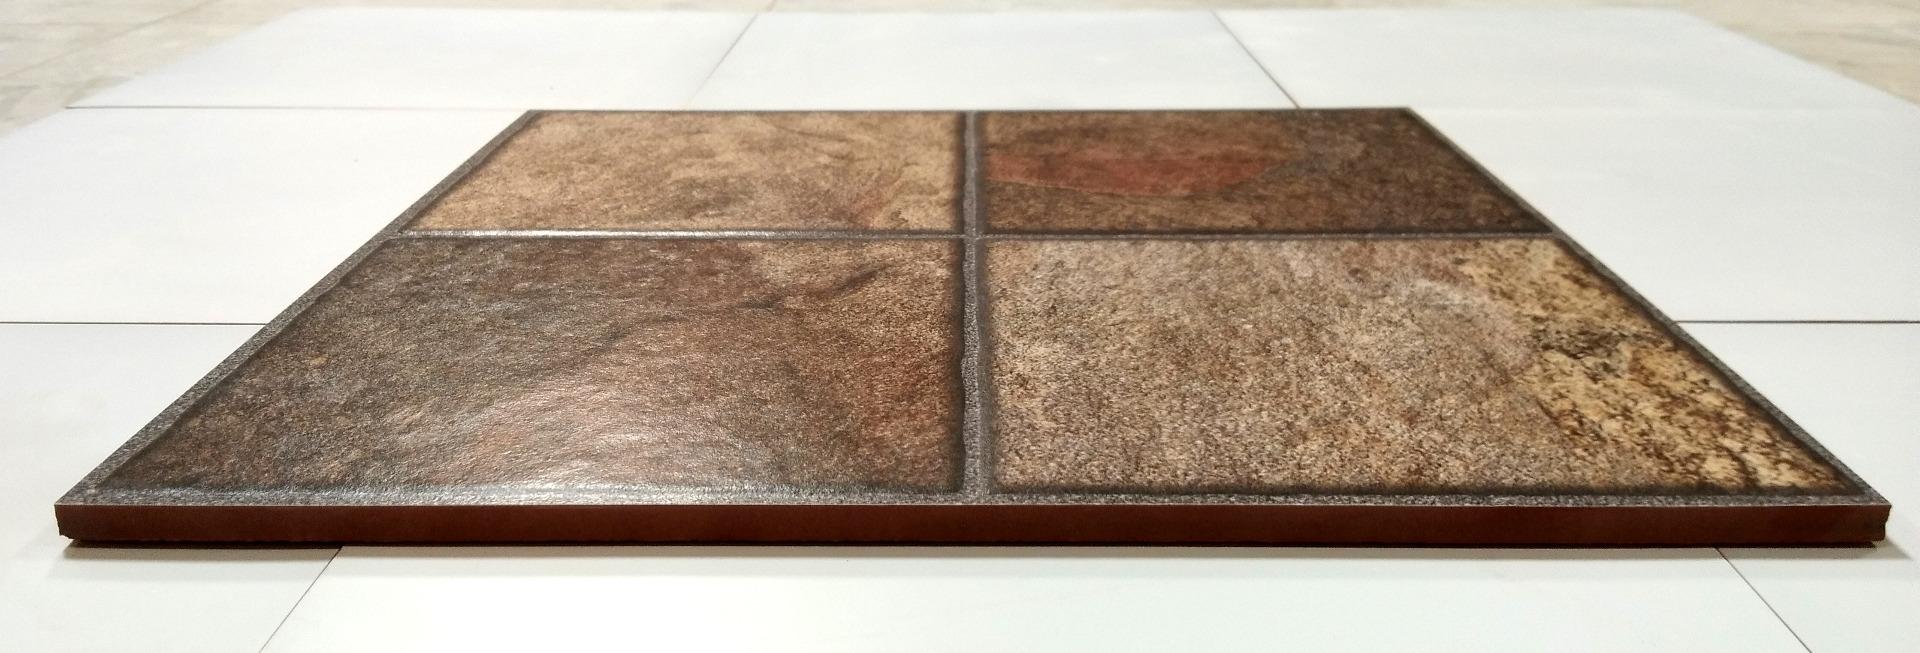 HRP Cobble Stone Natural